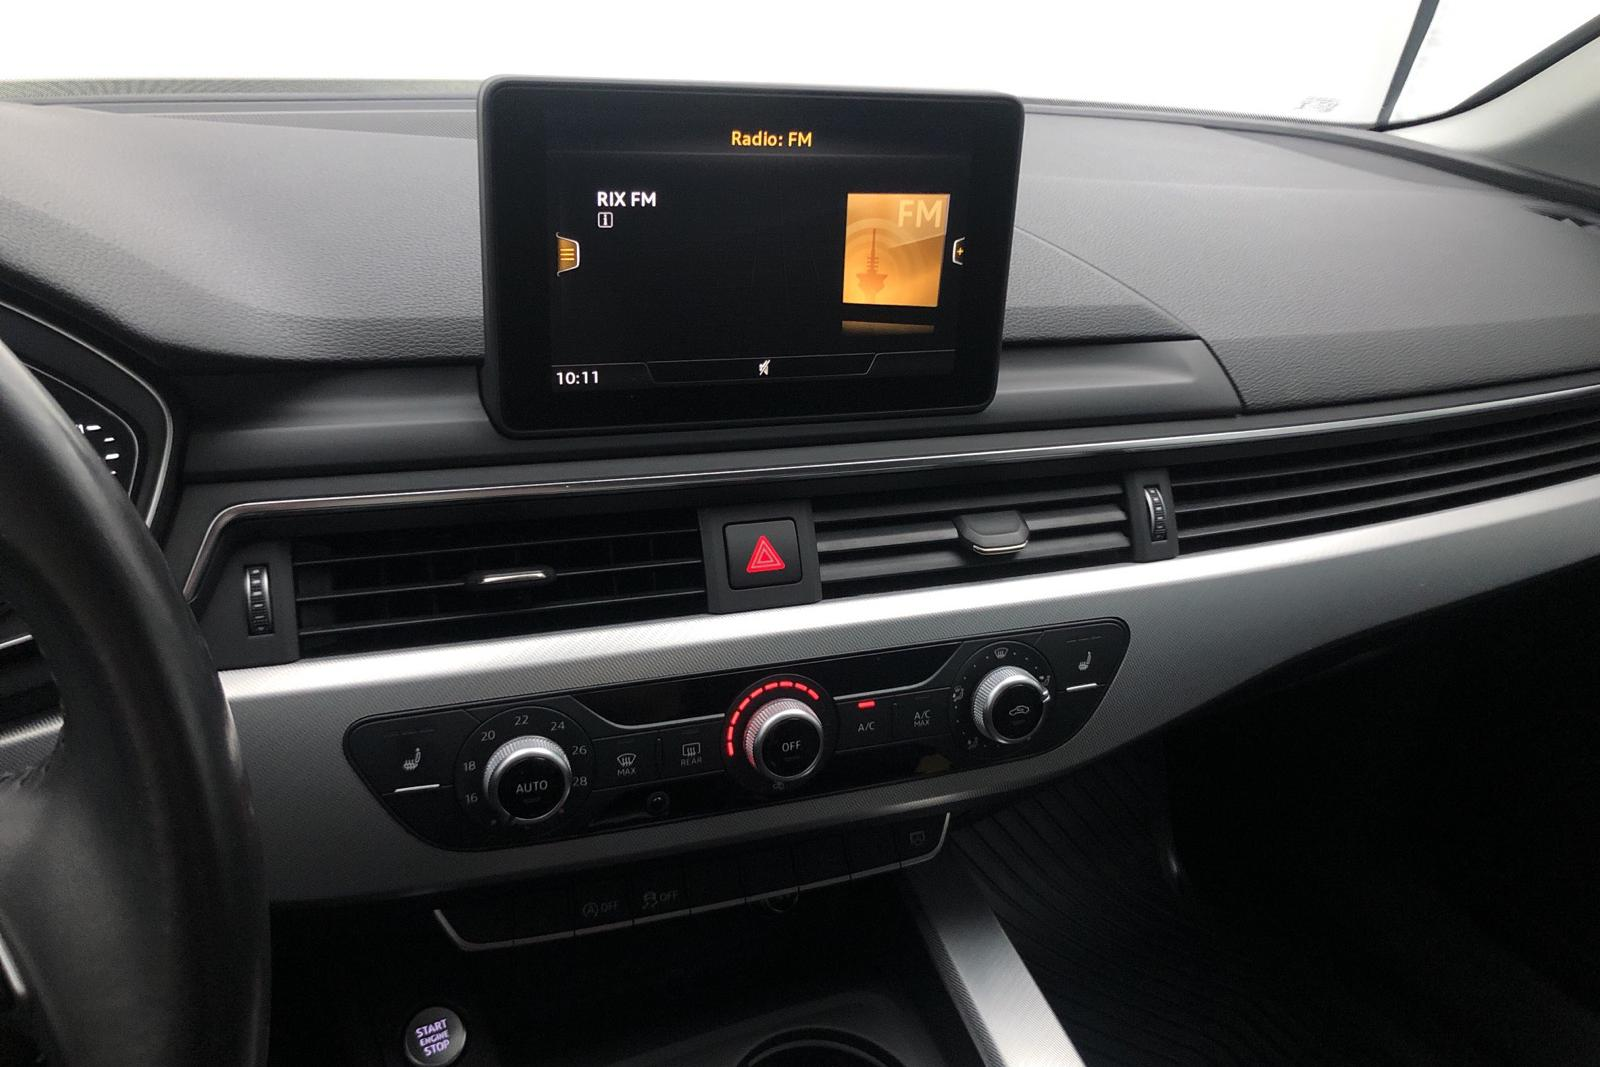 Audi A4 1.4 TFSI (150hk) - 7 000 mil - Manuell - svart - 2016